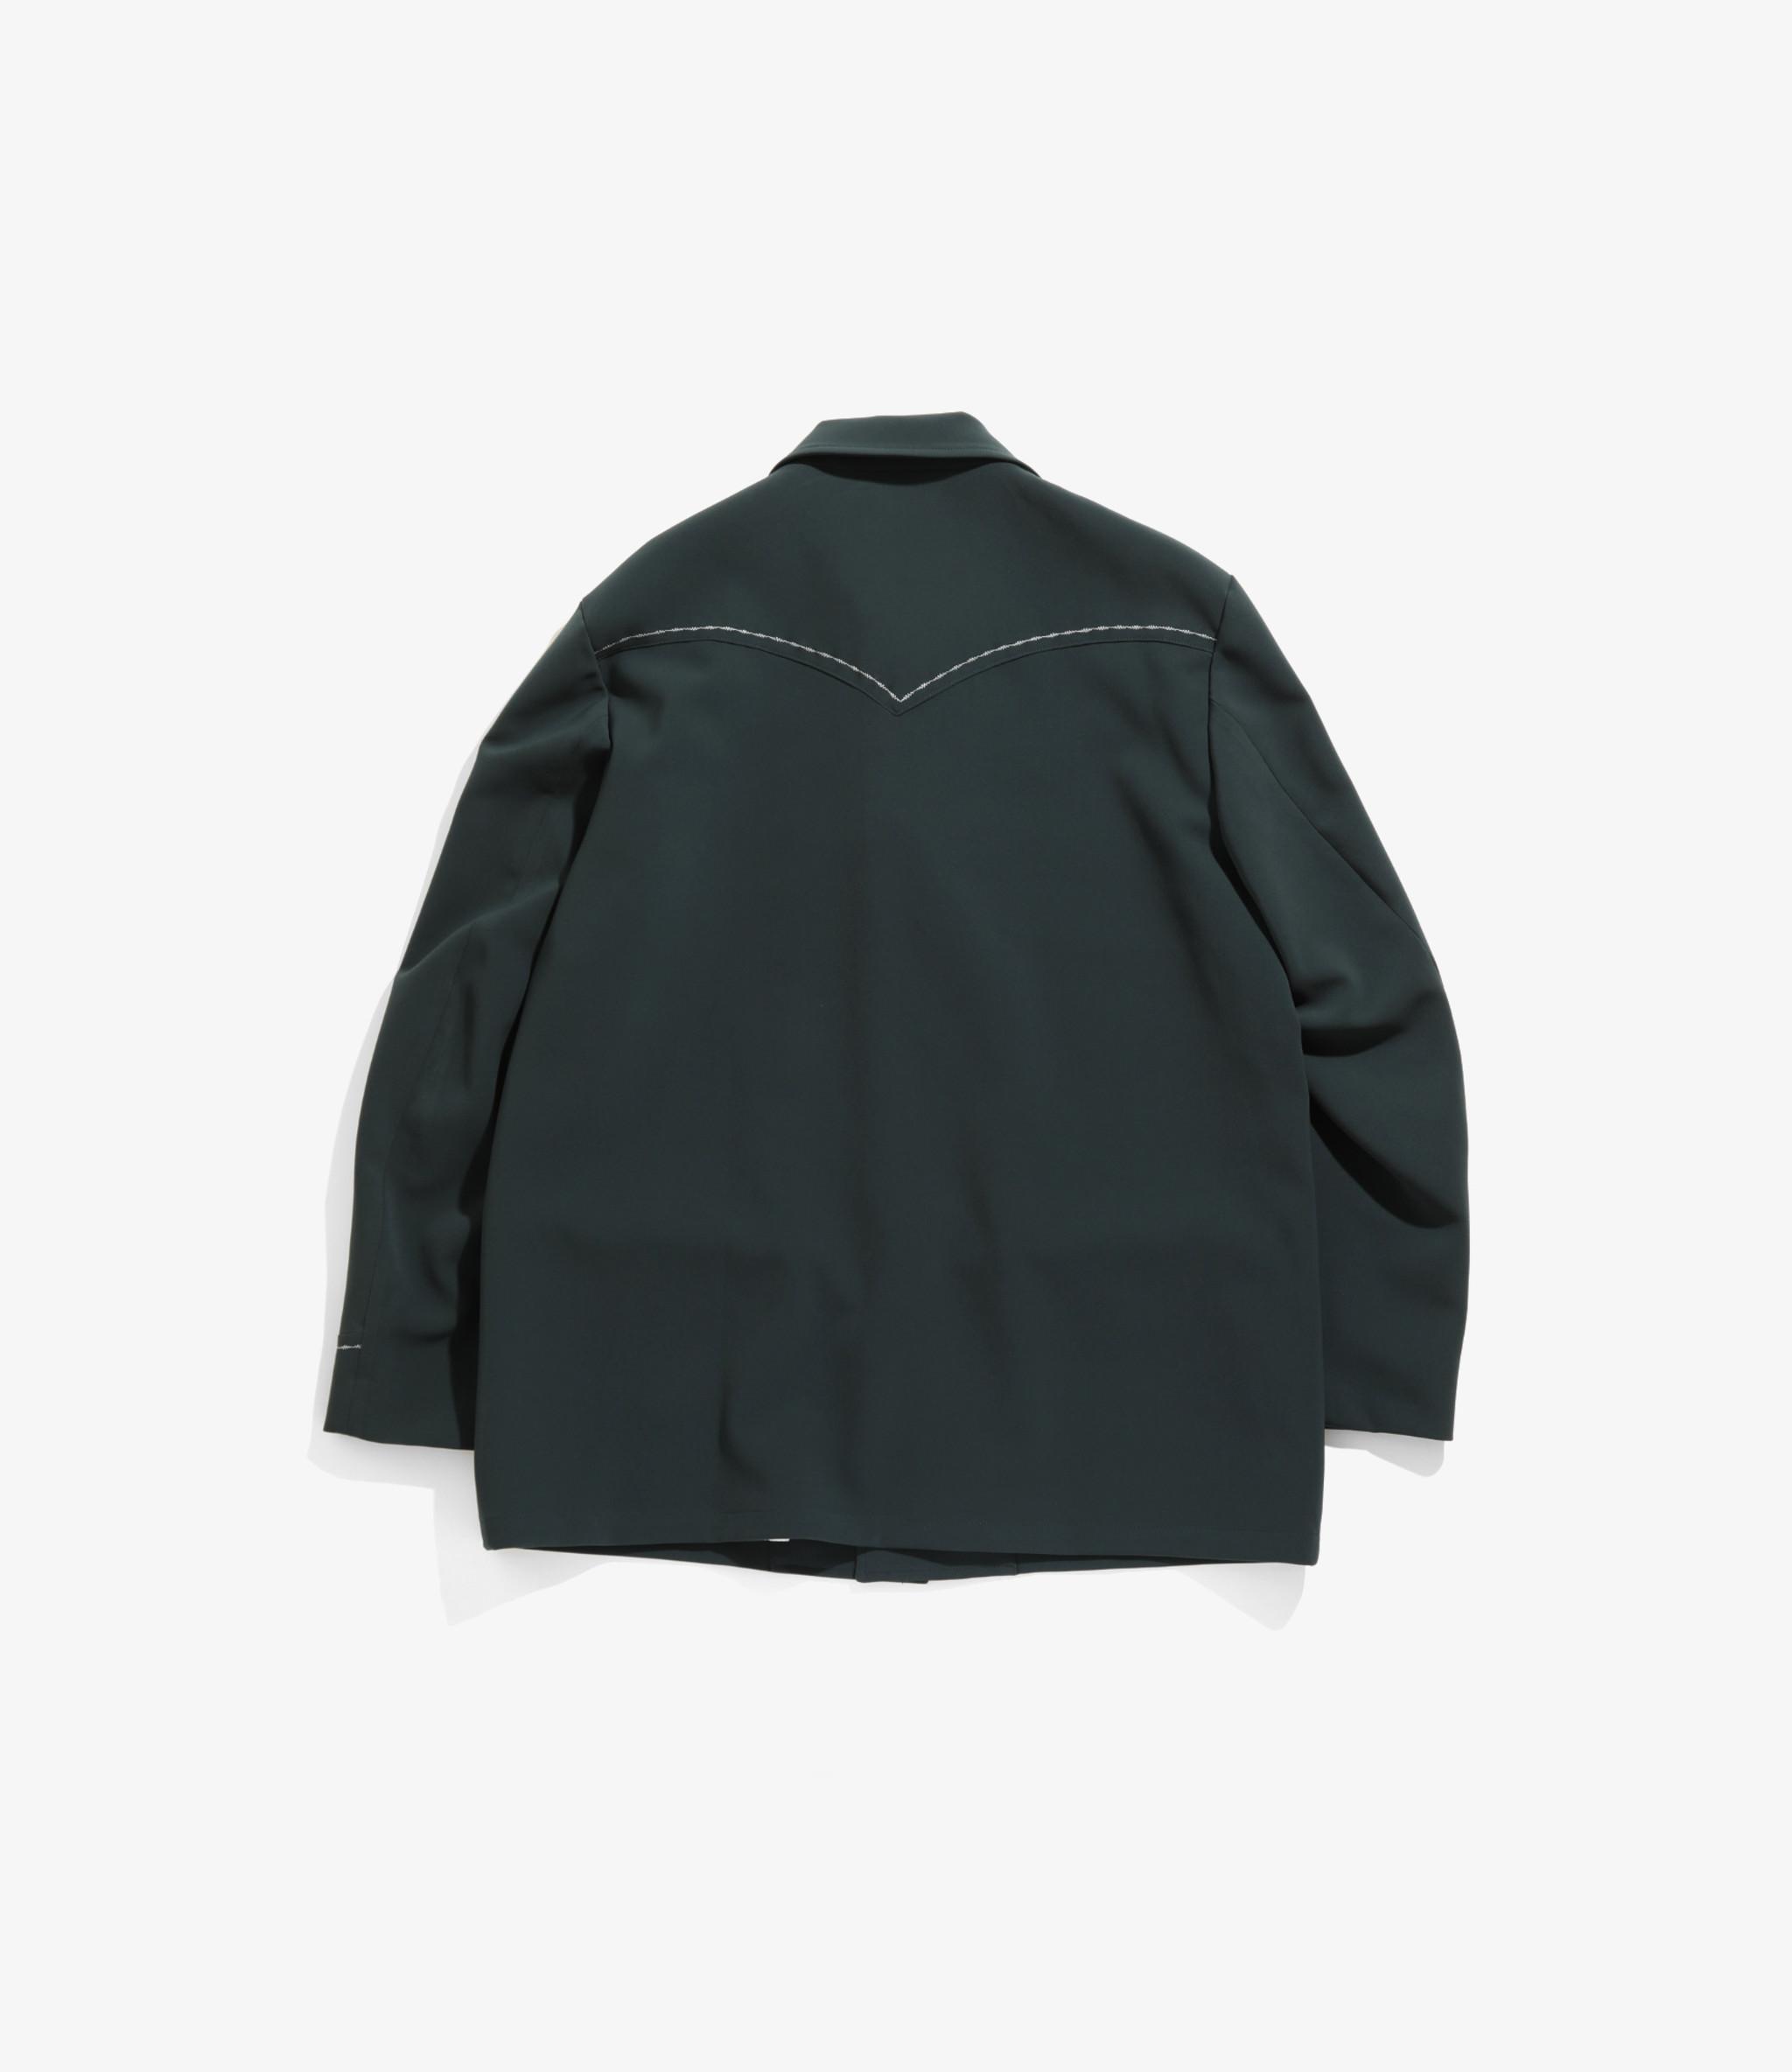 Needles Western Leisure Jacket - Pe/Pu Double Cloth - Green